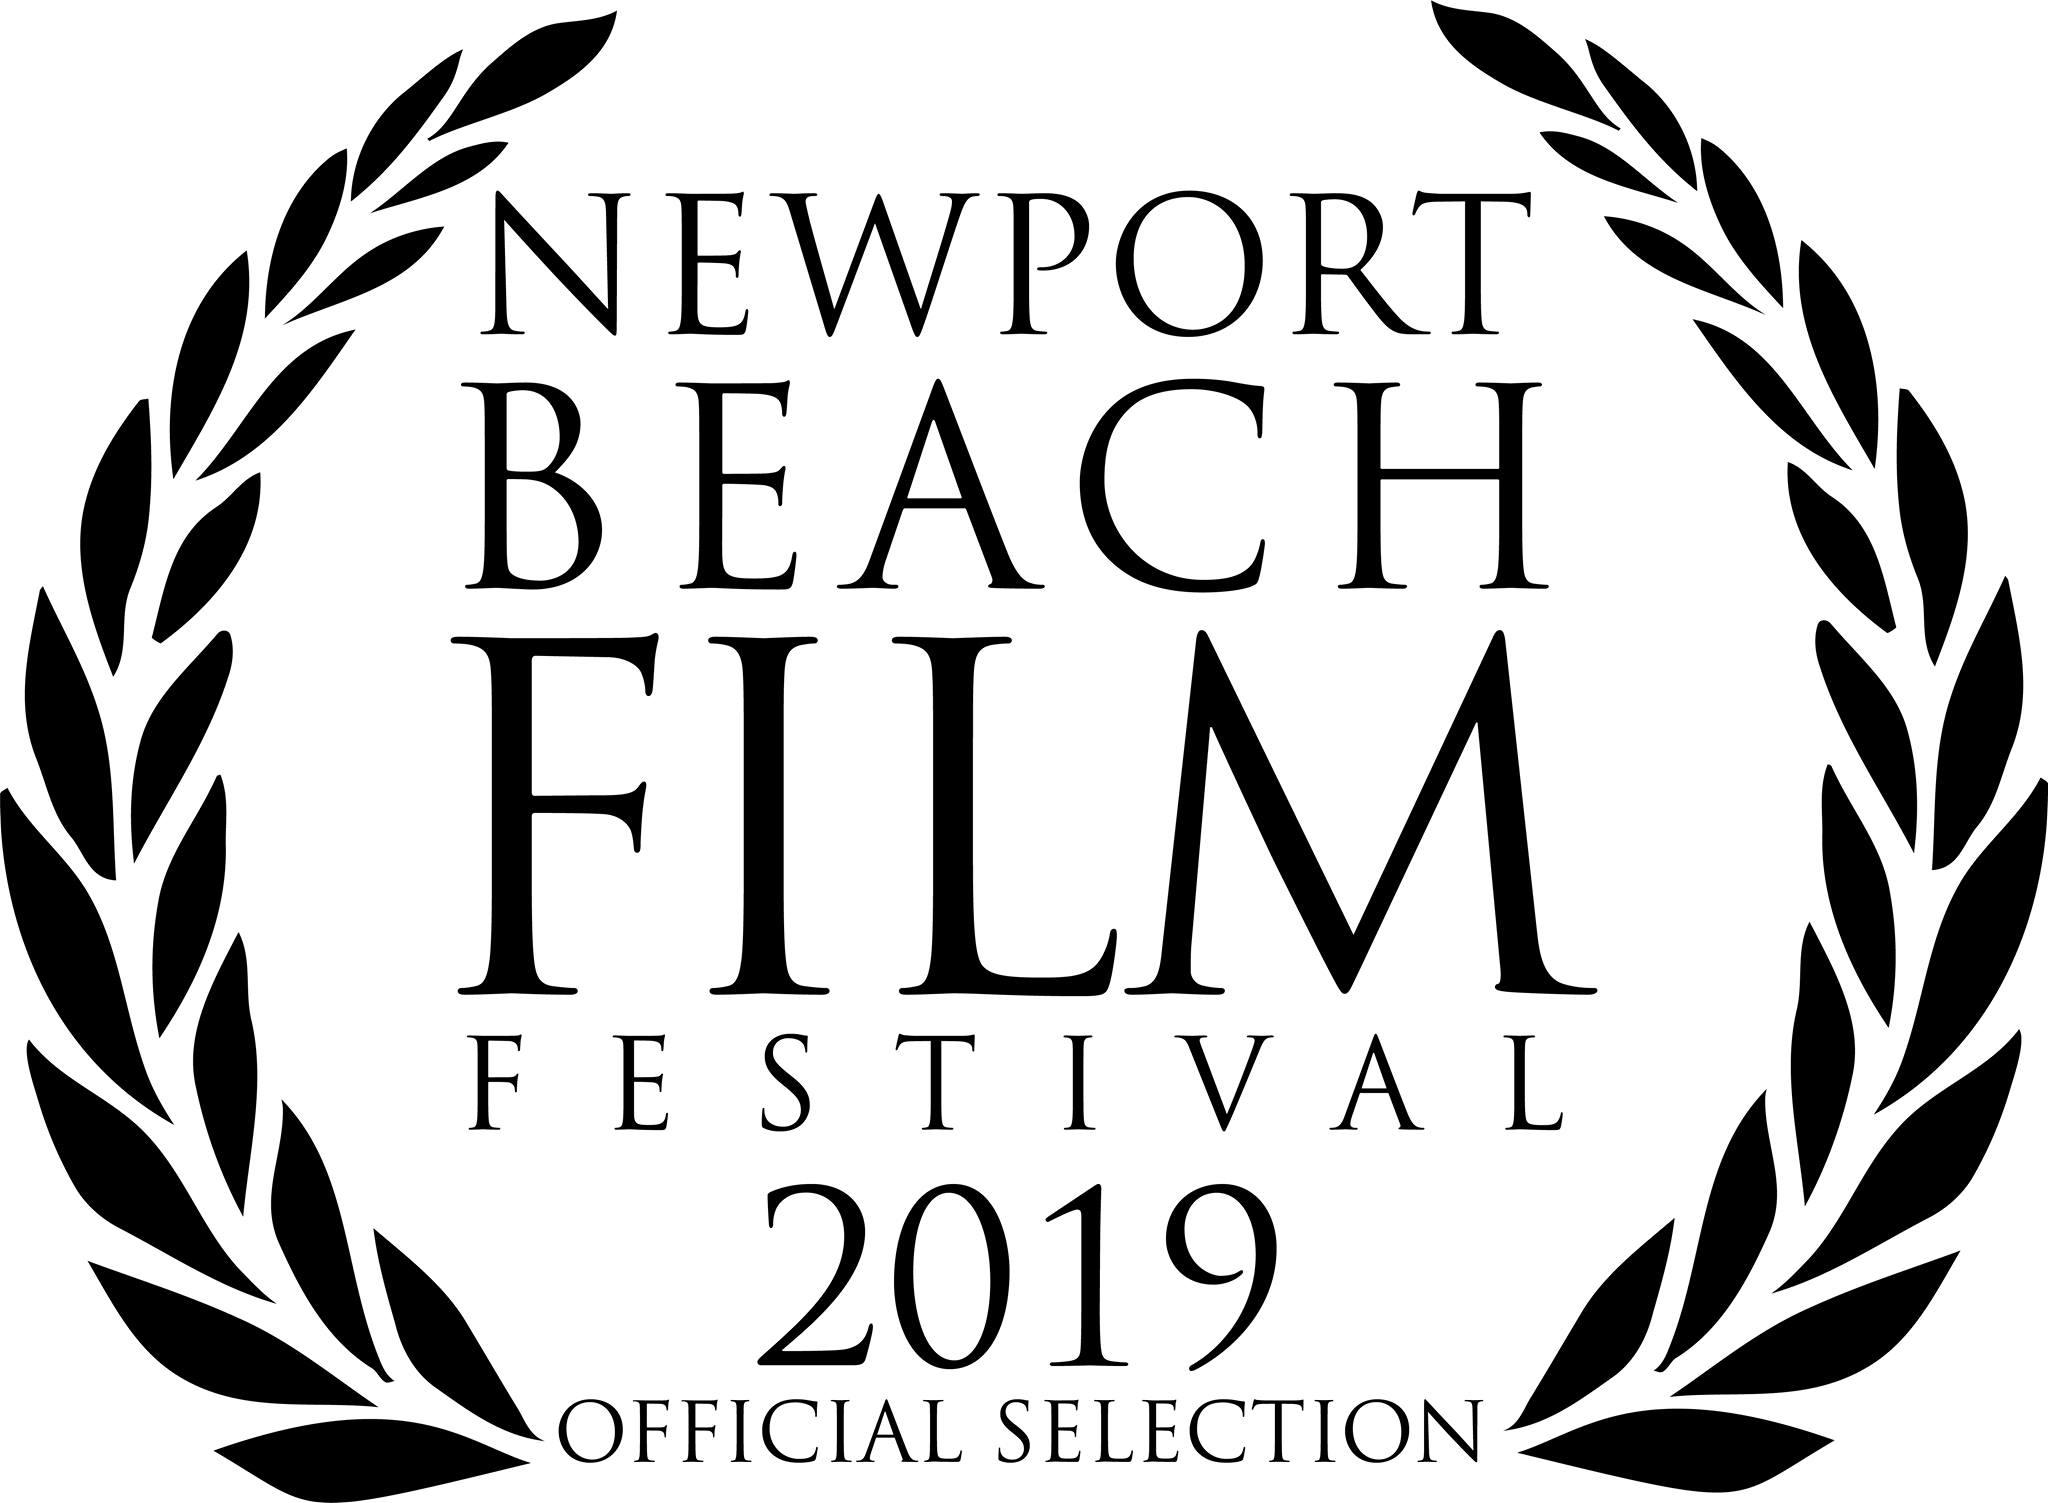 Newport Beach FF.jpg